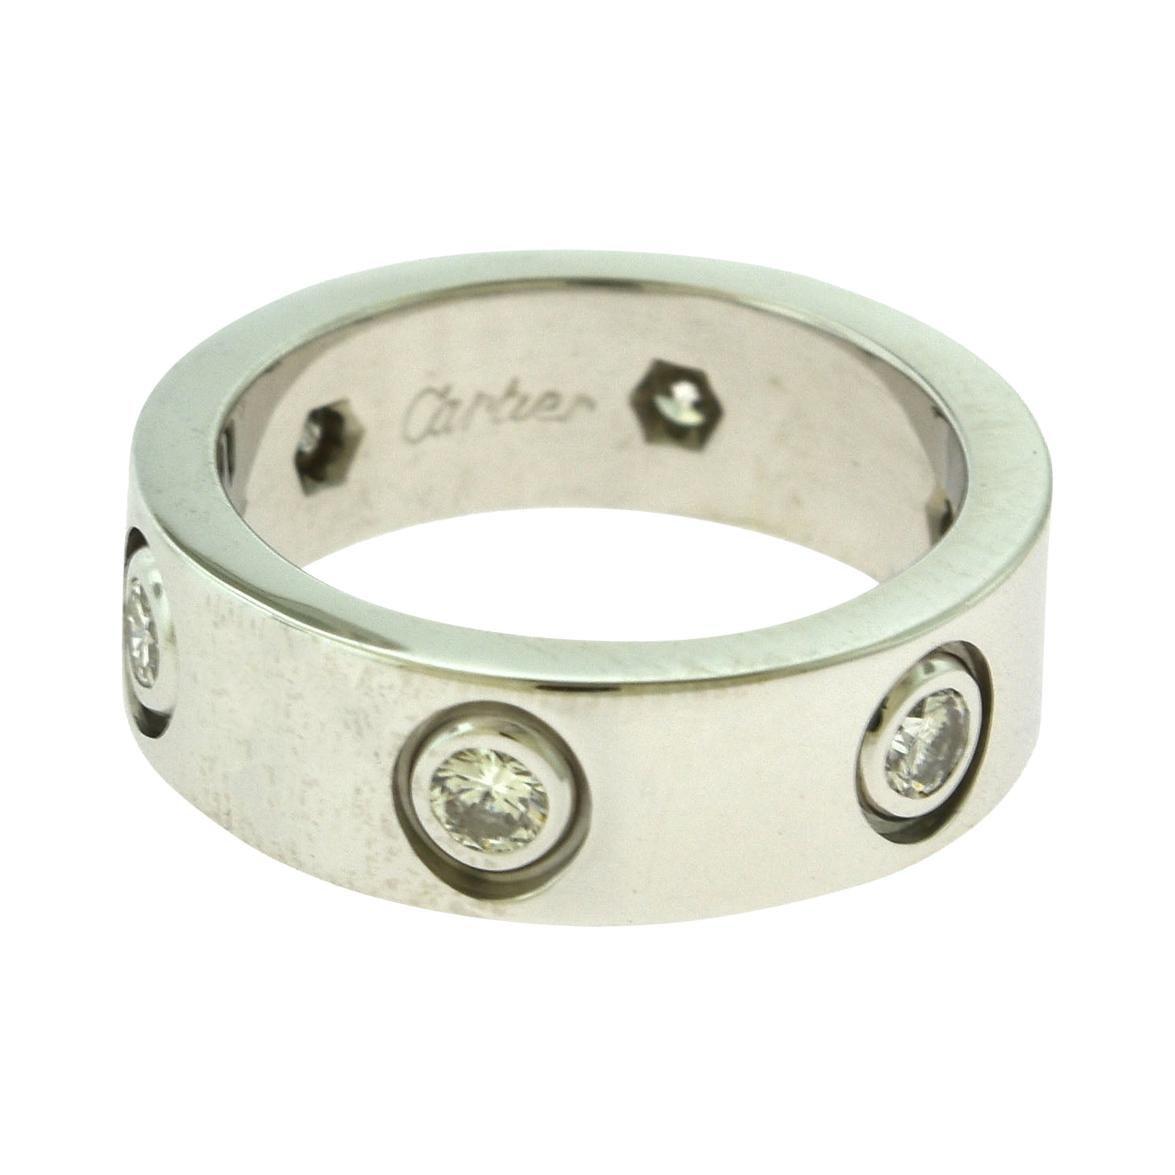 Cartier 18 Karat White Gold 6 Diamonds Love Ring